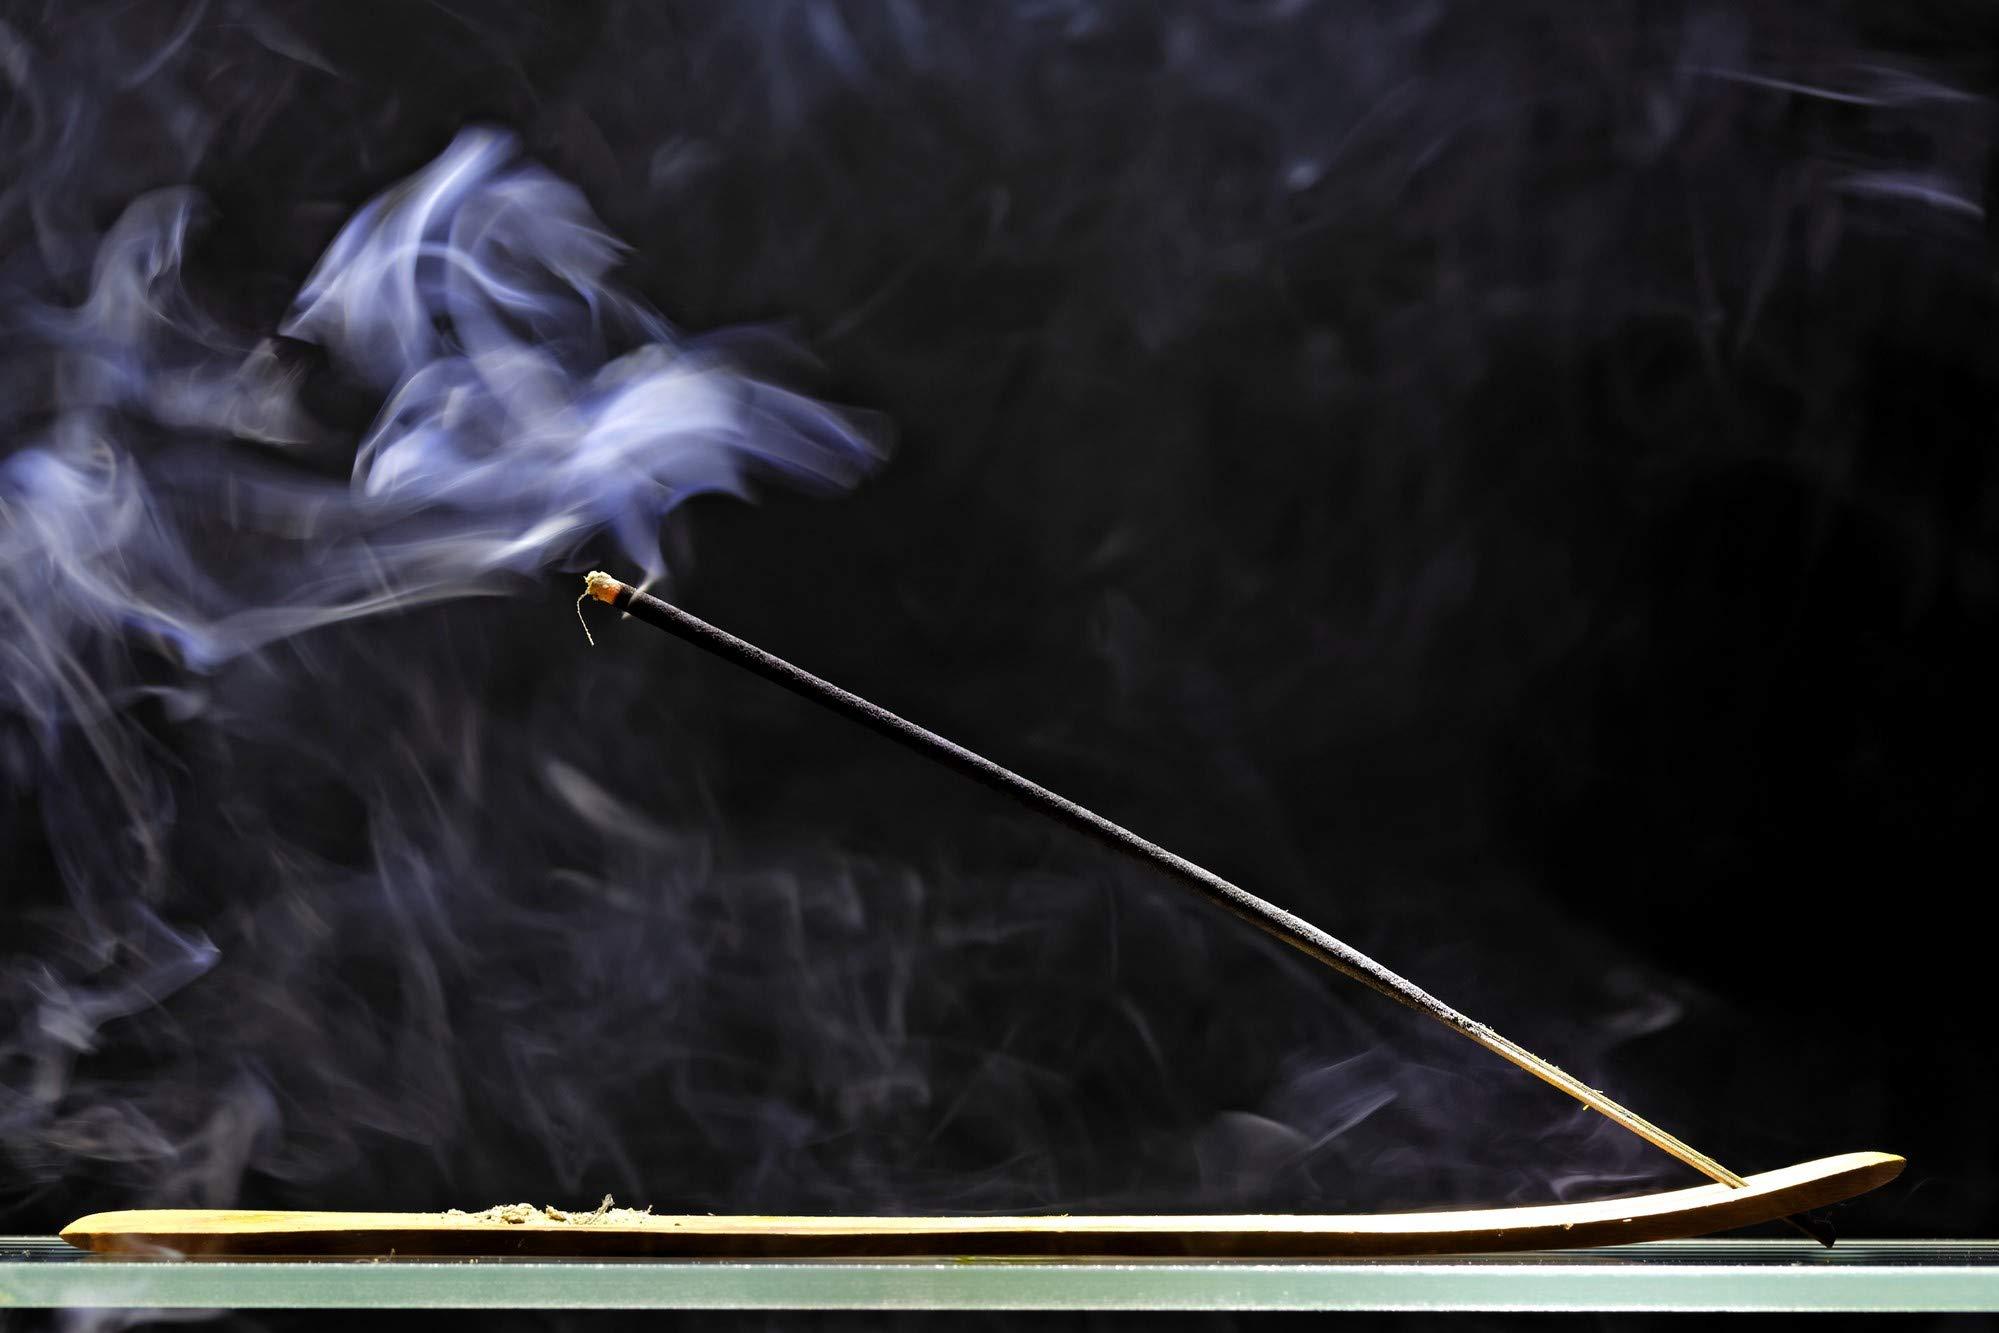 Genuine Oud Incense Sticks - New by Sensari (Image #3)